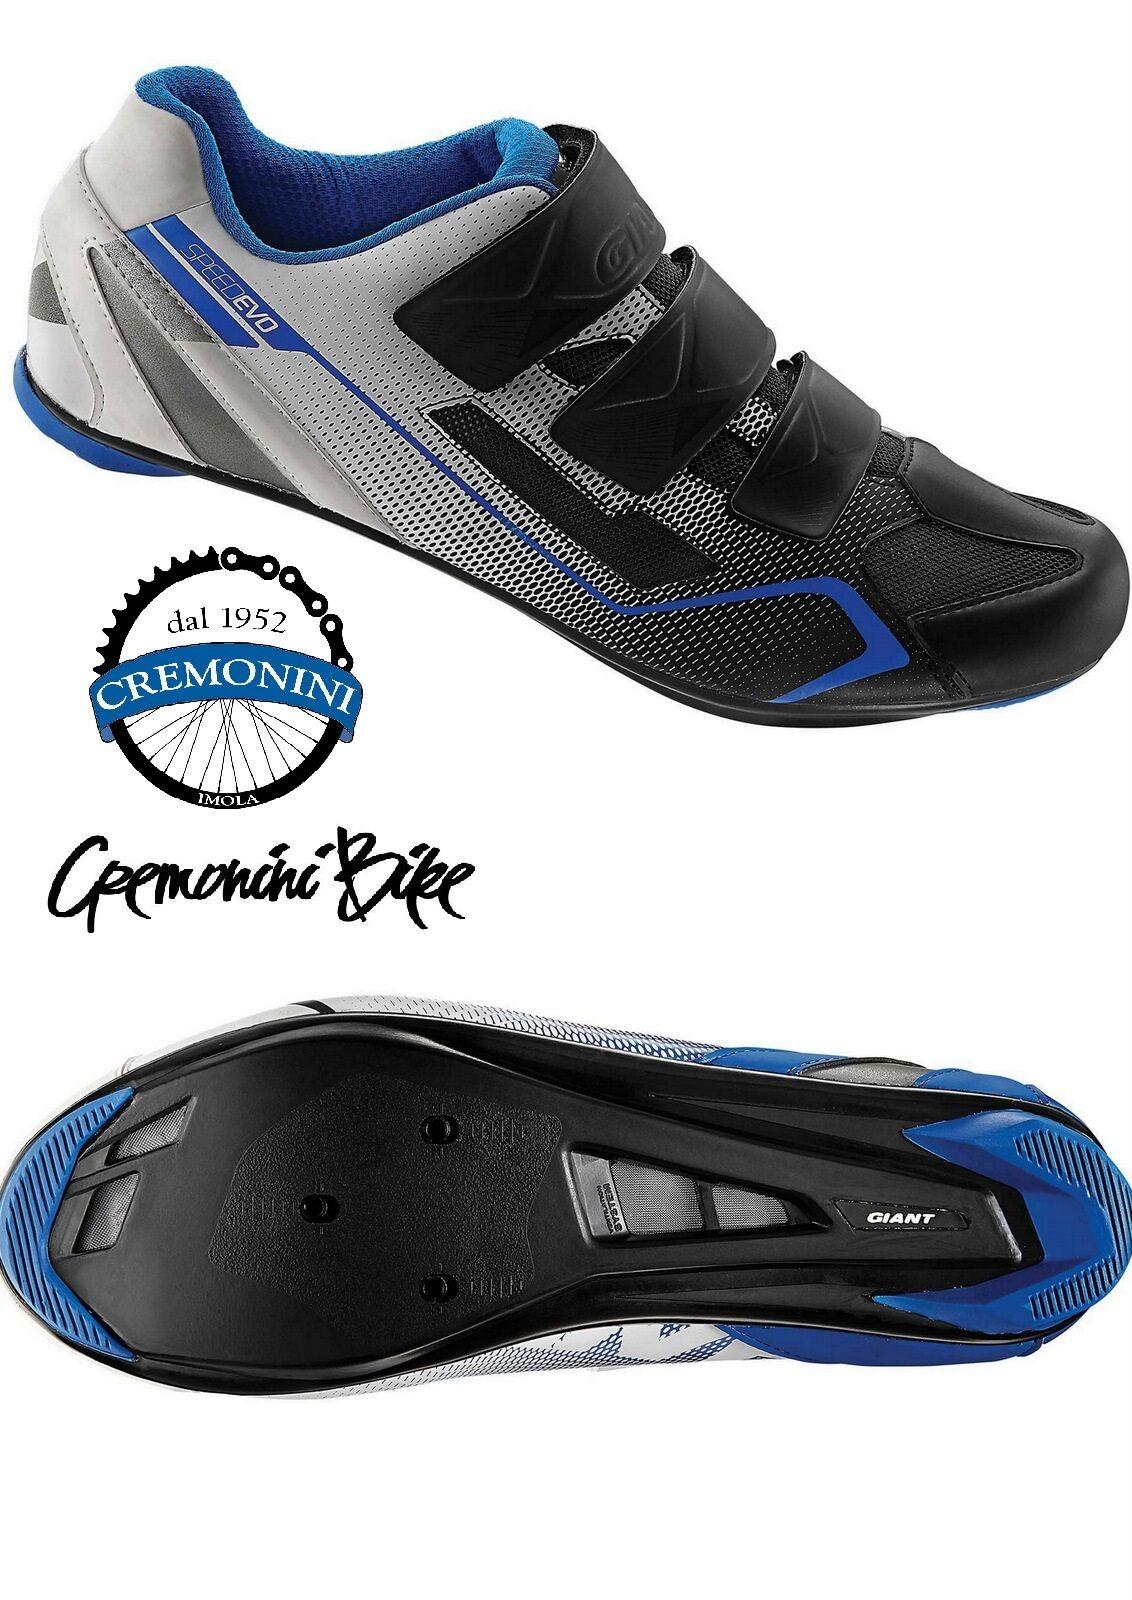 GIANT scarpe ciclismo bici corsa uomo man bike road scarpe BOLT 3 fori blu nere